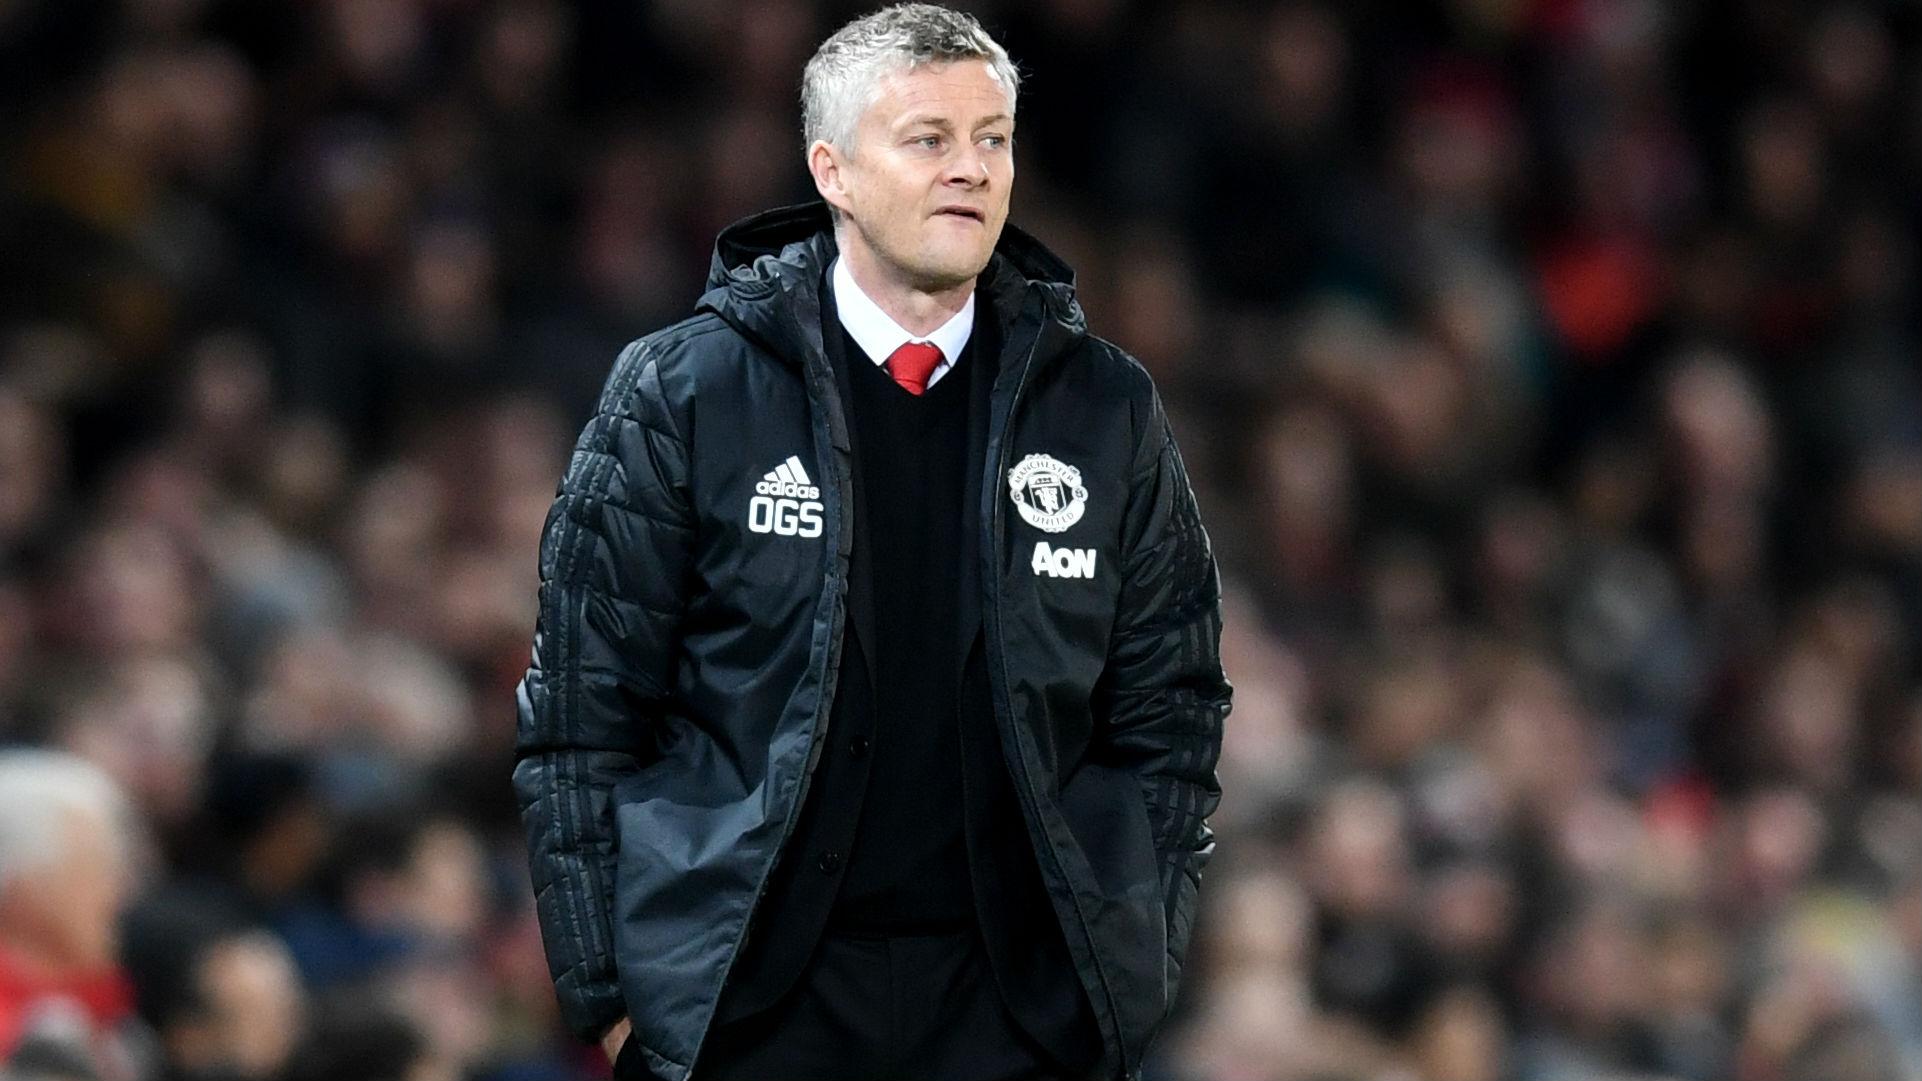 Gary Neville praises PSG performance and rates Man Utd's chance of progressing